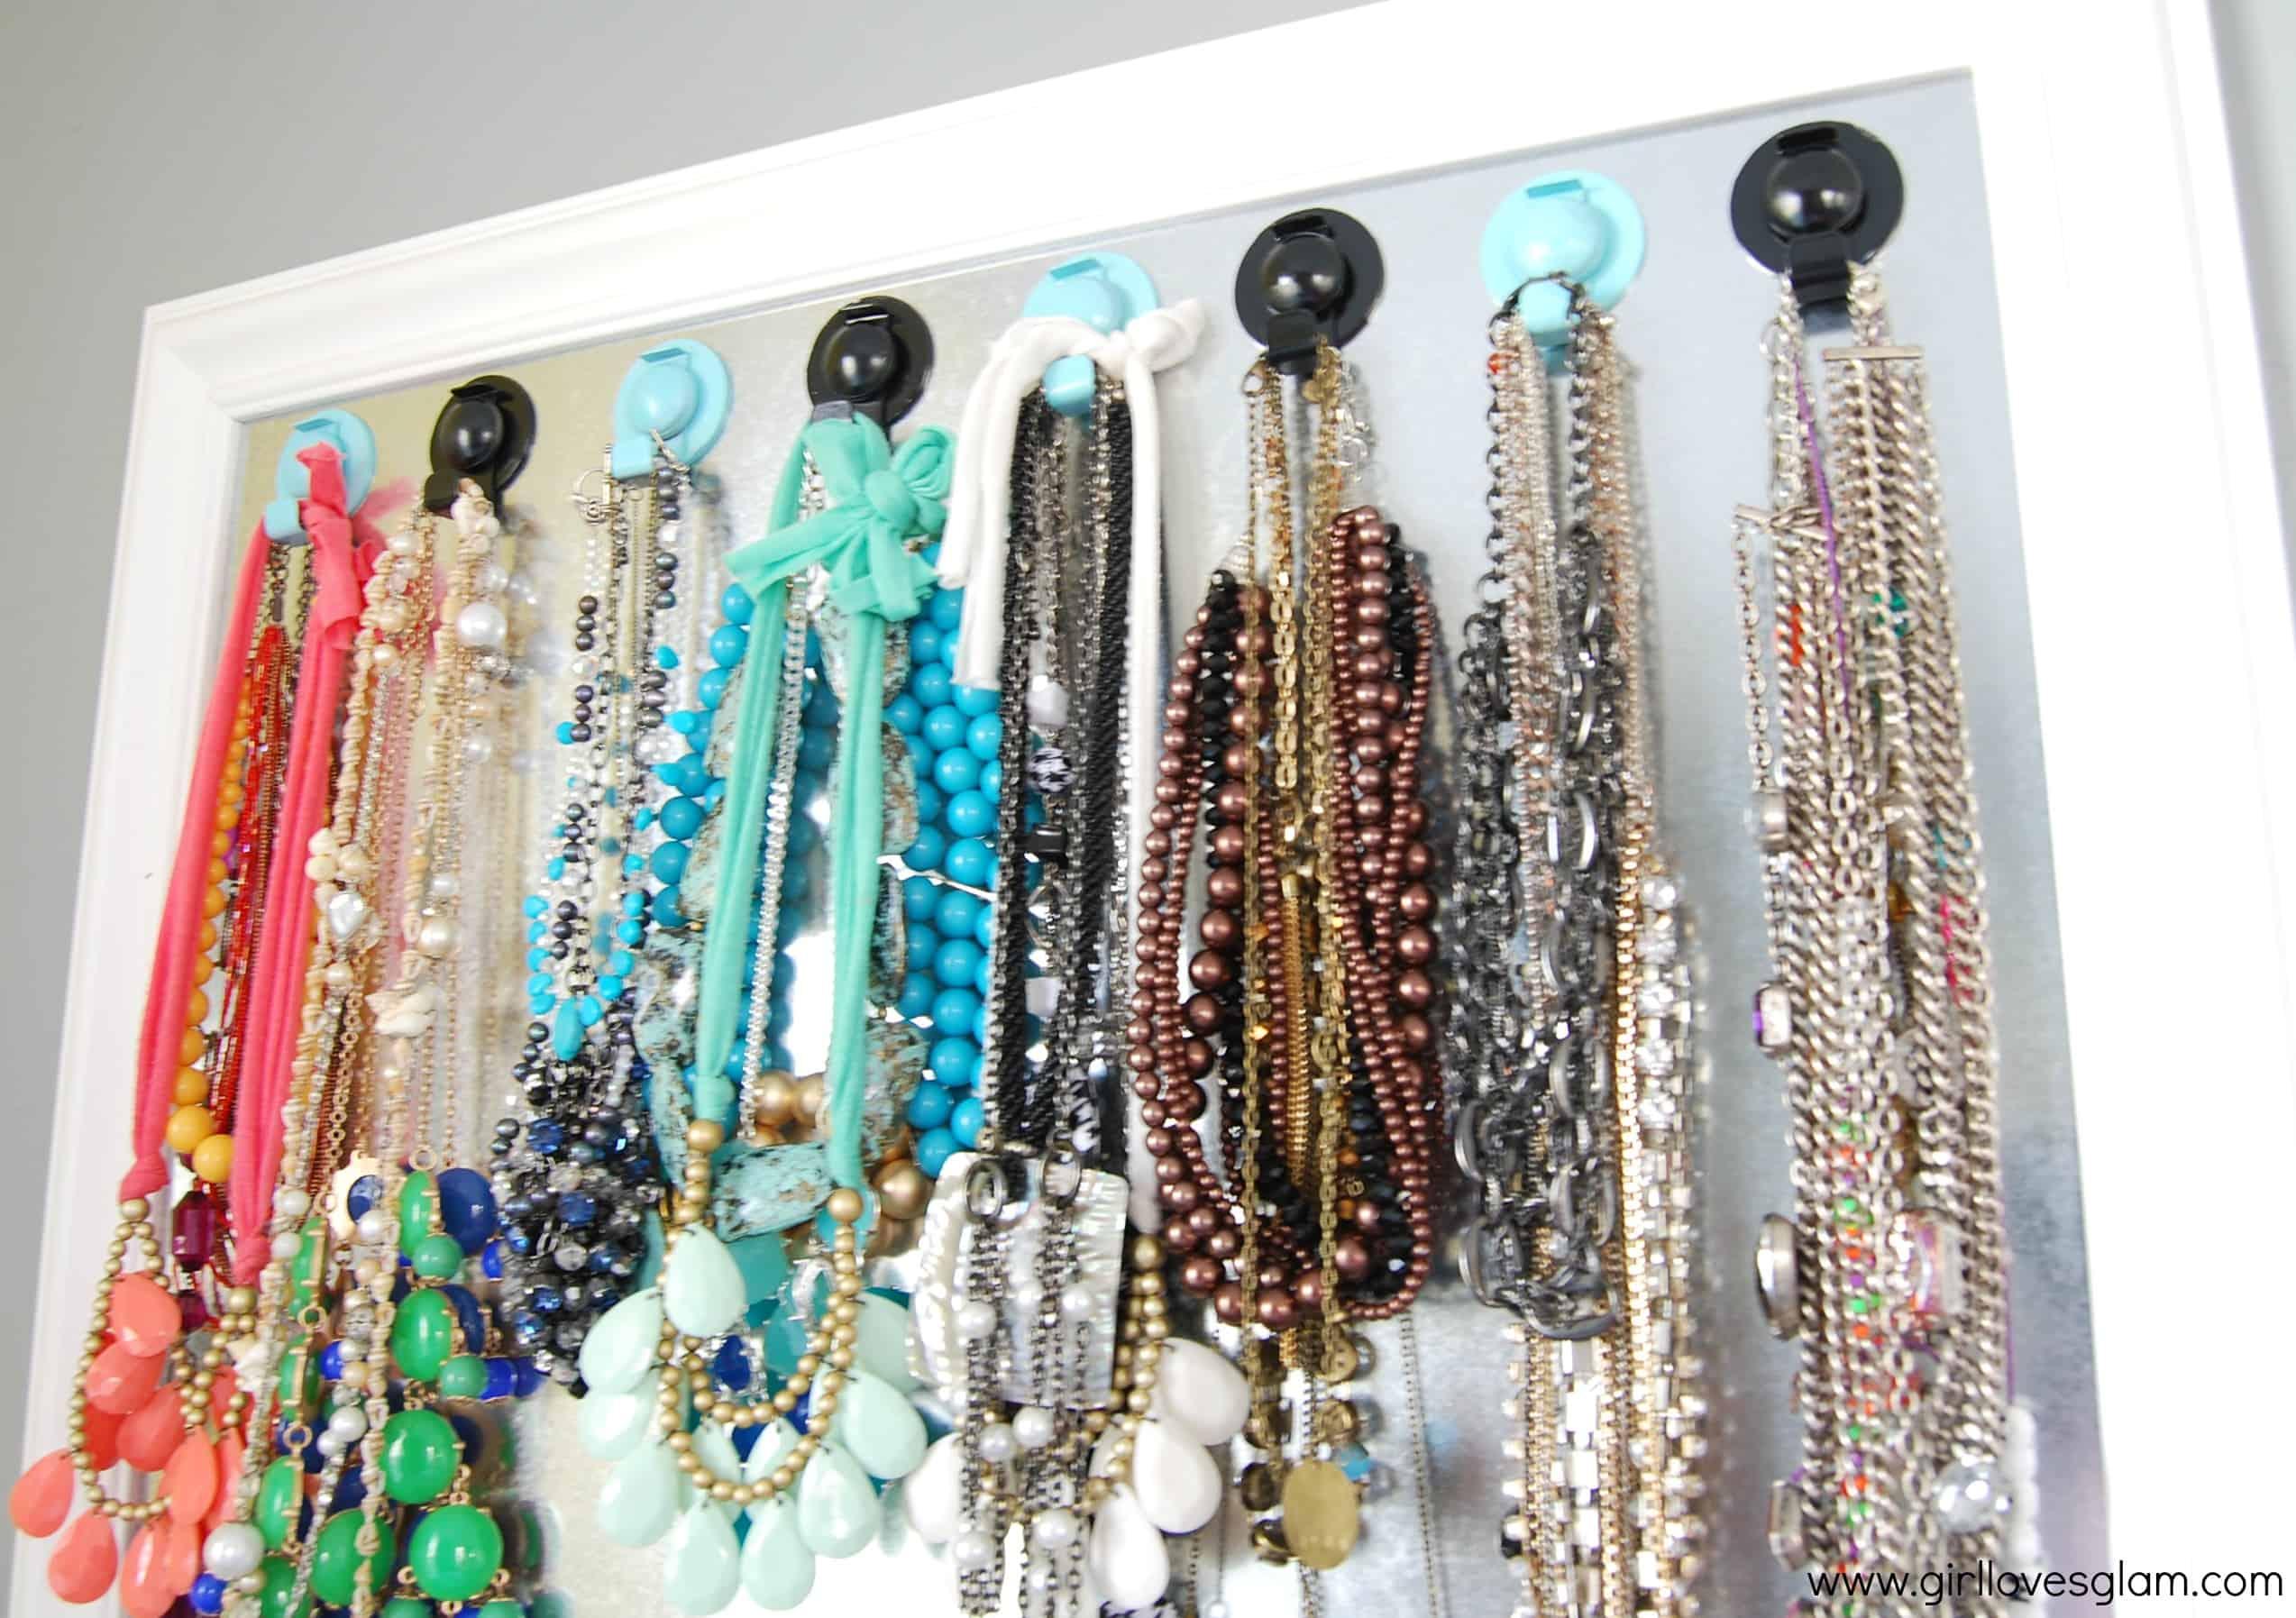 Cute Office Decor Deco Board Jewelry Hanger Organizer Girl Loves Glam